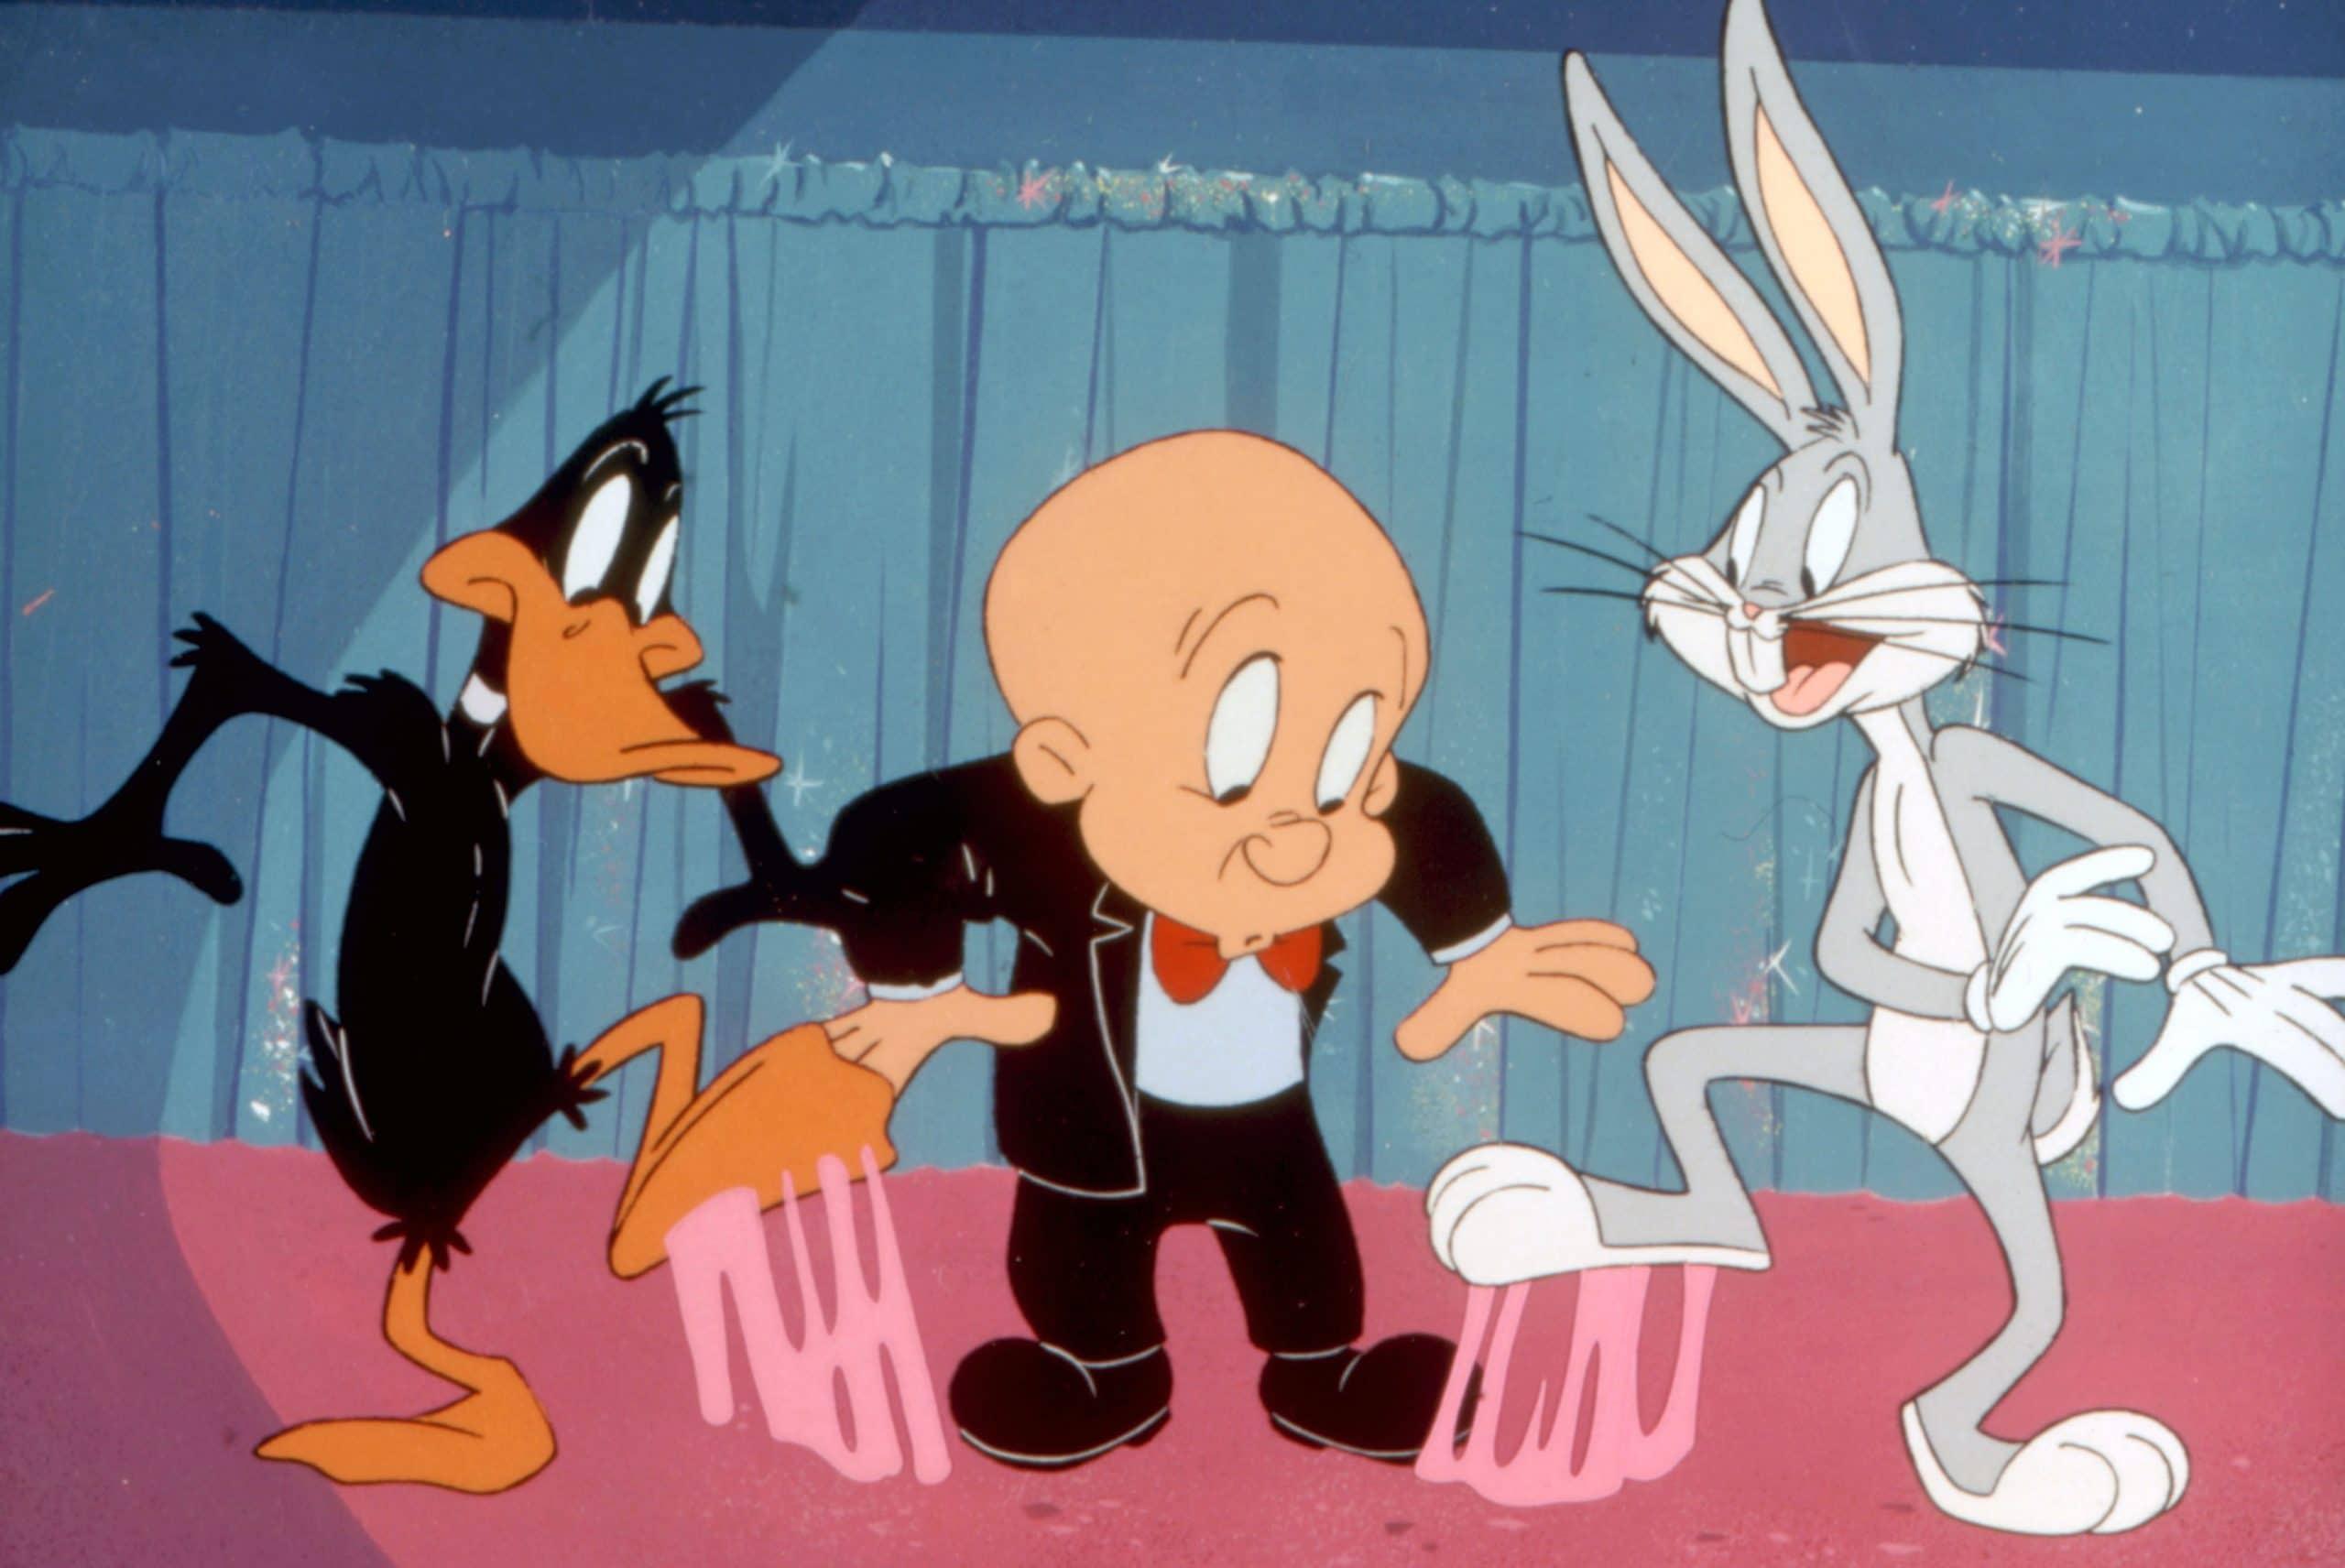 BOX-OFFICE BUNNY, Daffy Duck, Elmer Fudd, Bugs Bunny looney tunes